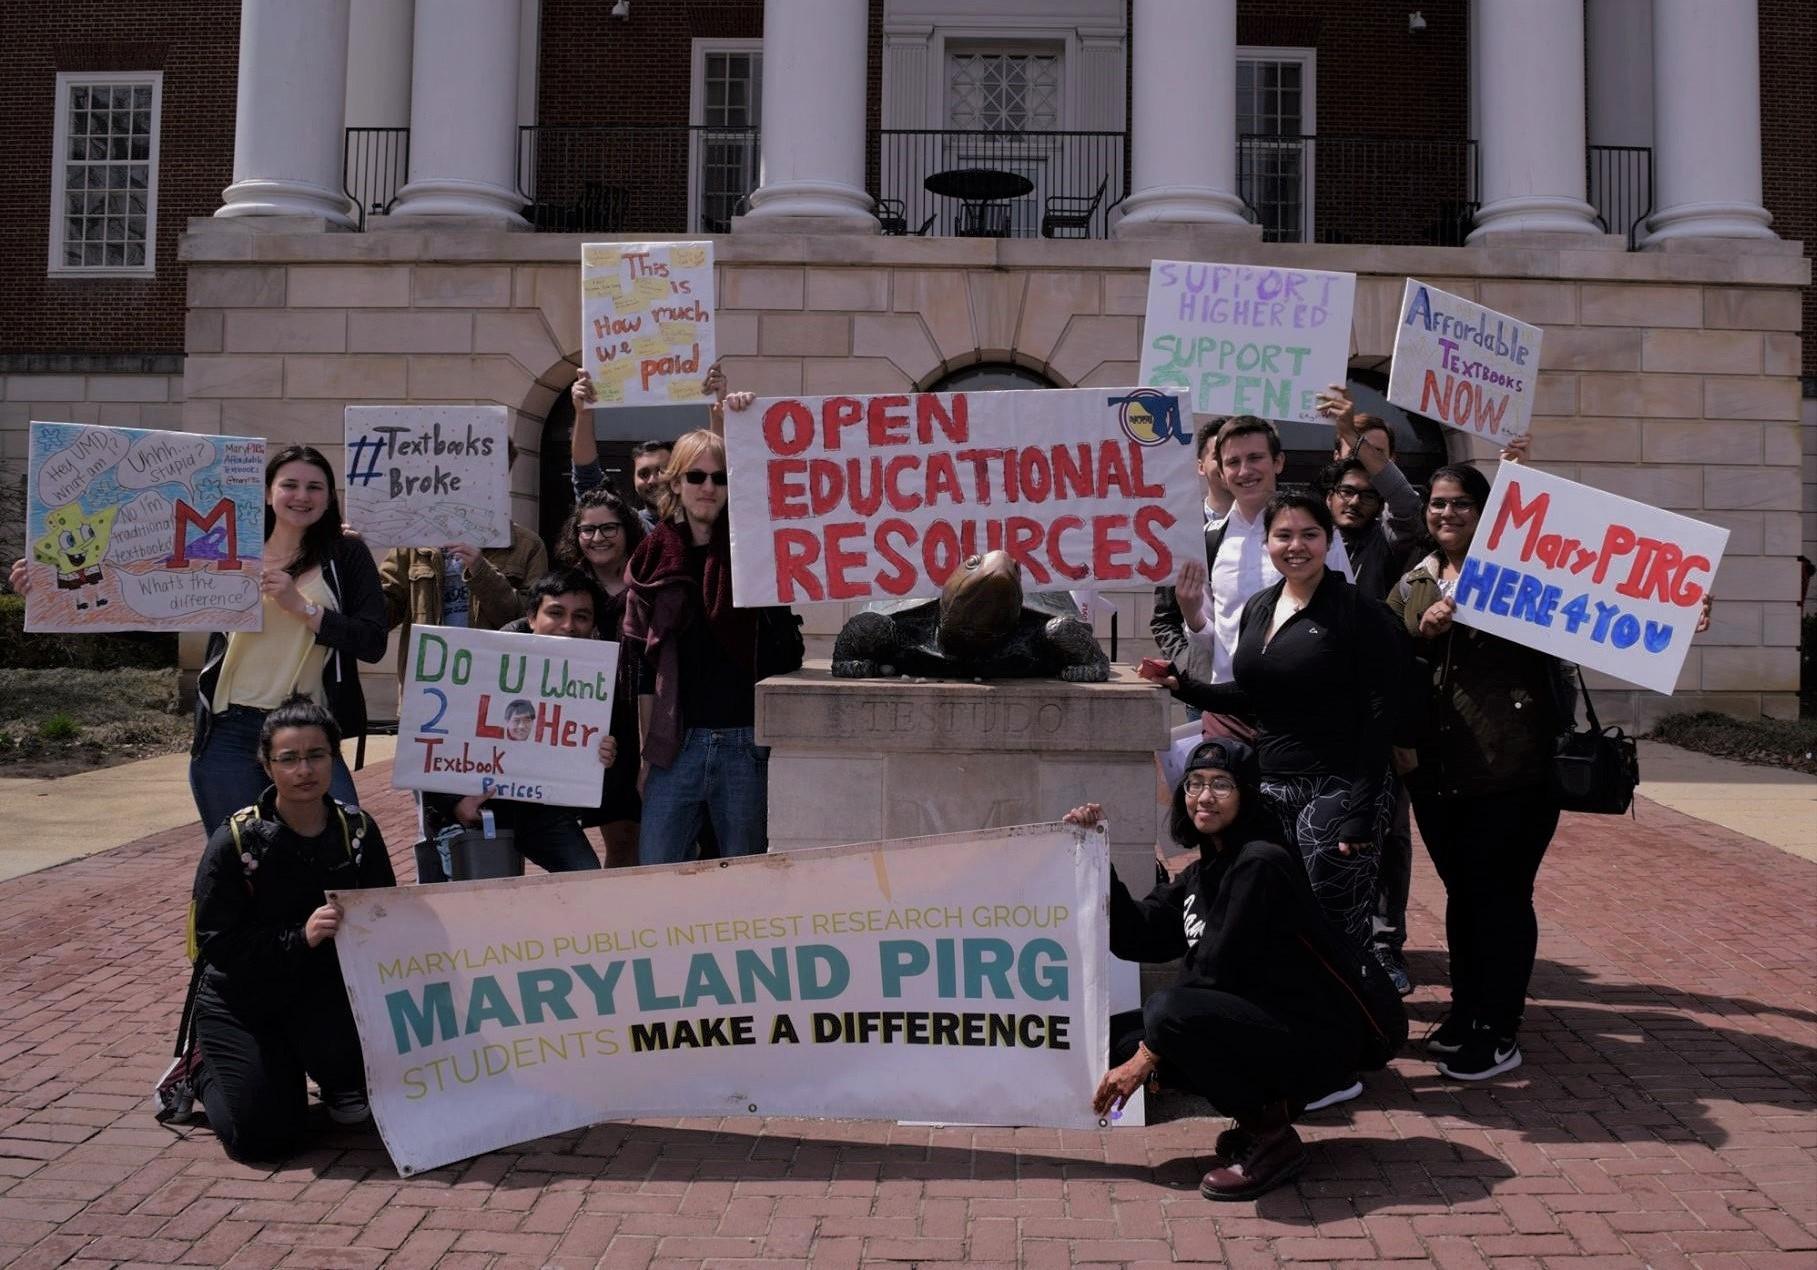 (c) Marylandpirgstudents.org